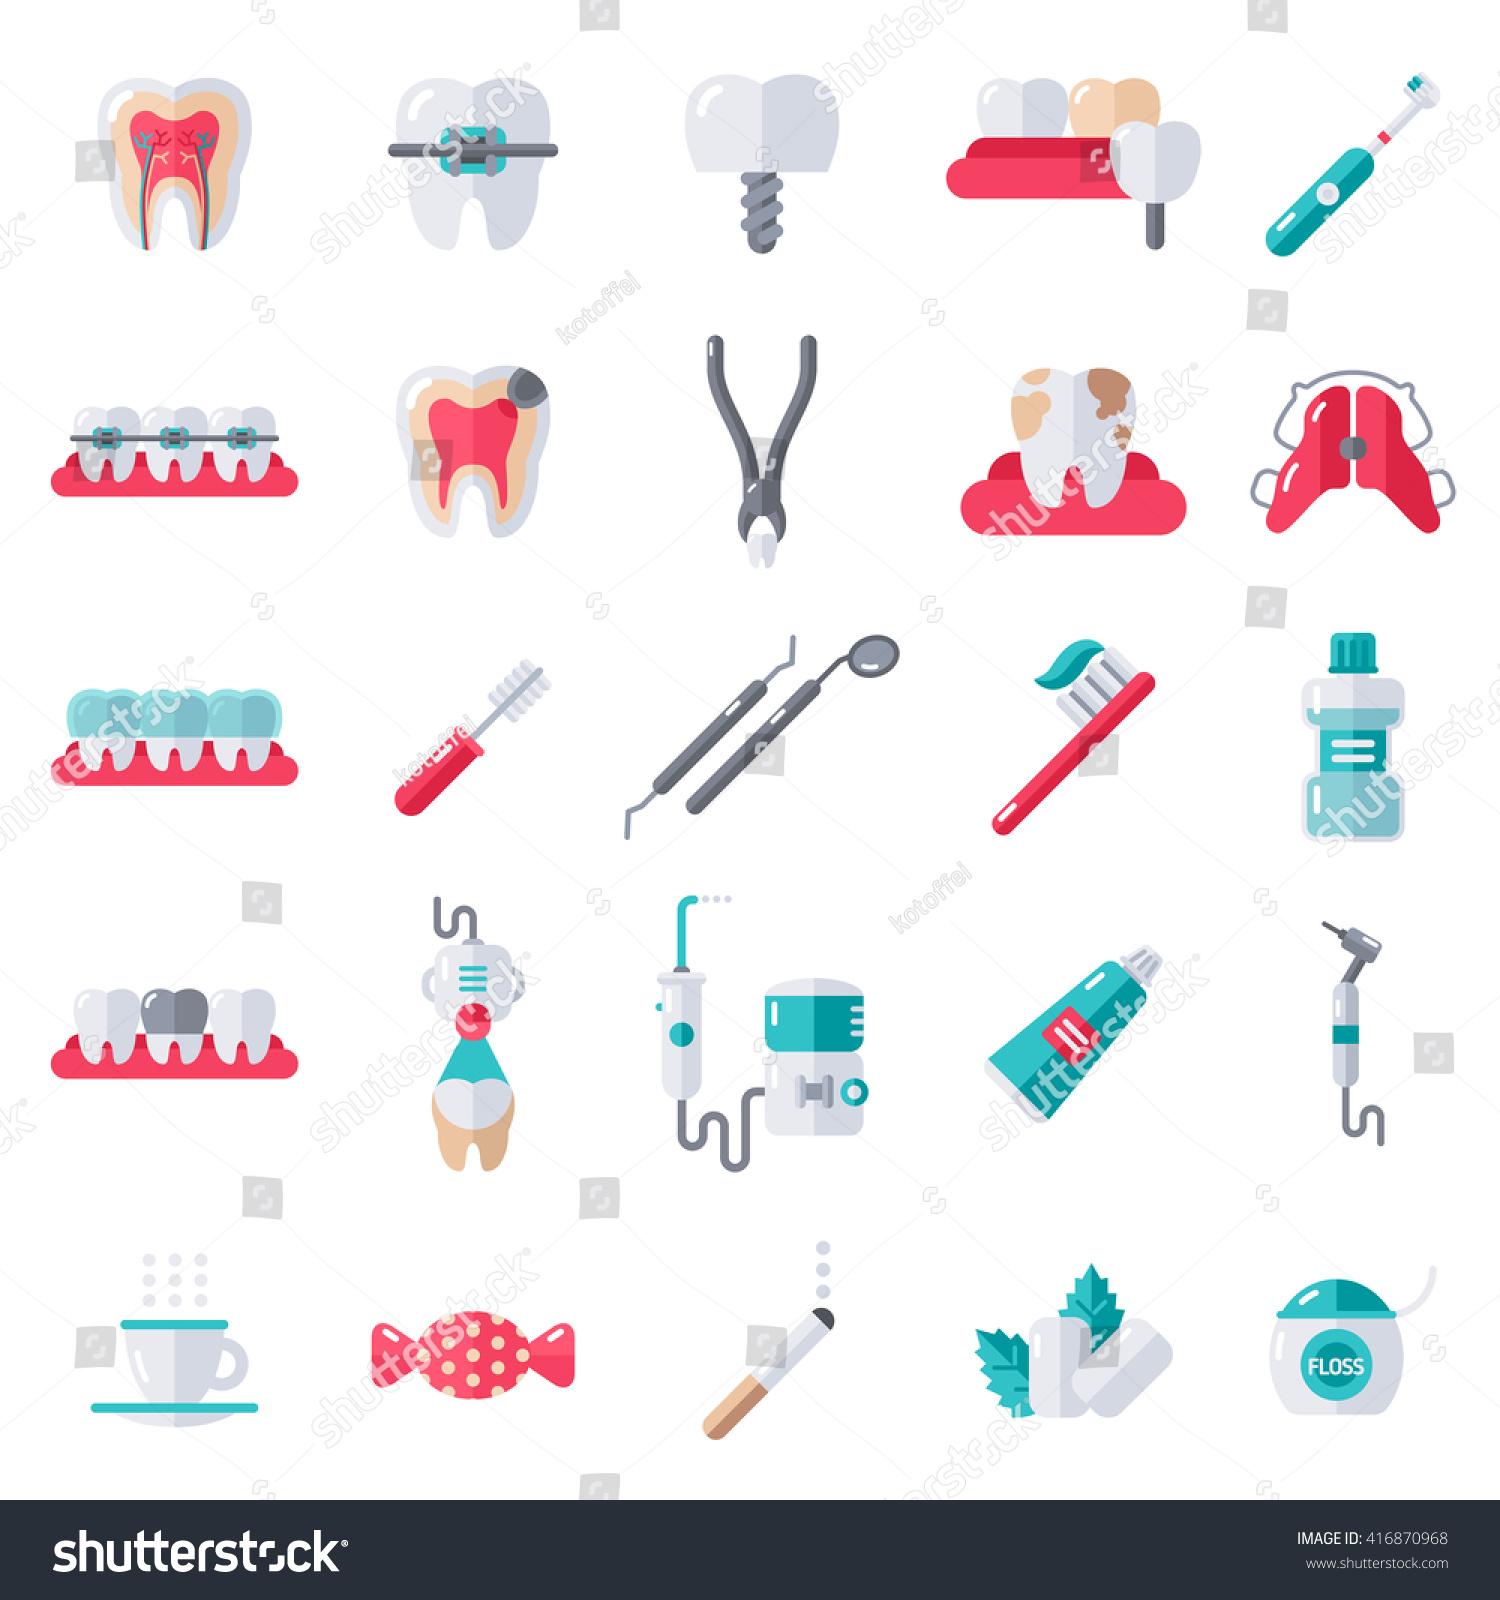 Dental Flat Icons Set Vector Illustration Stock Vector ...